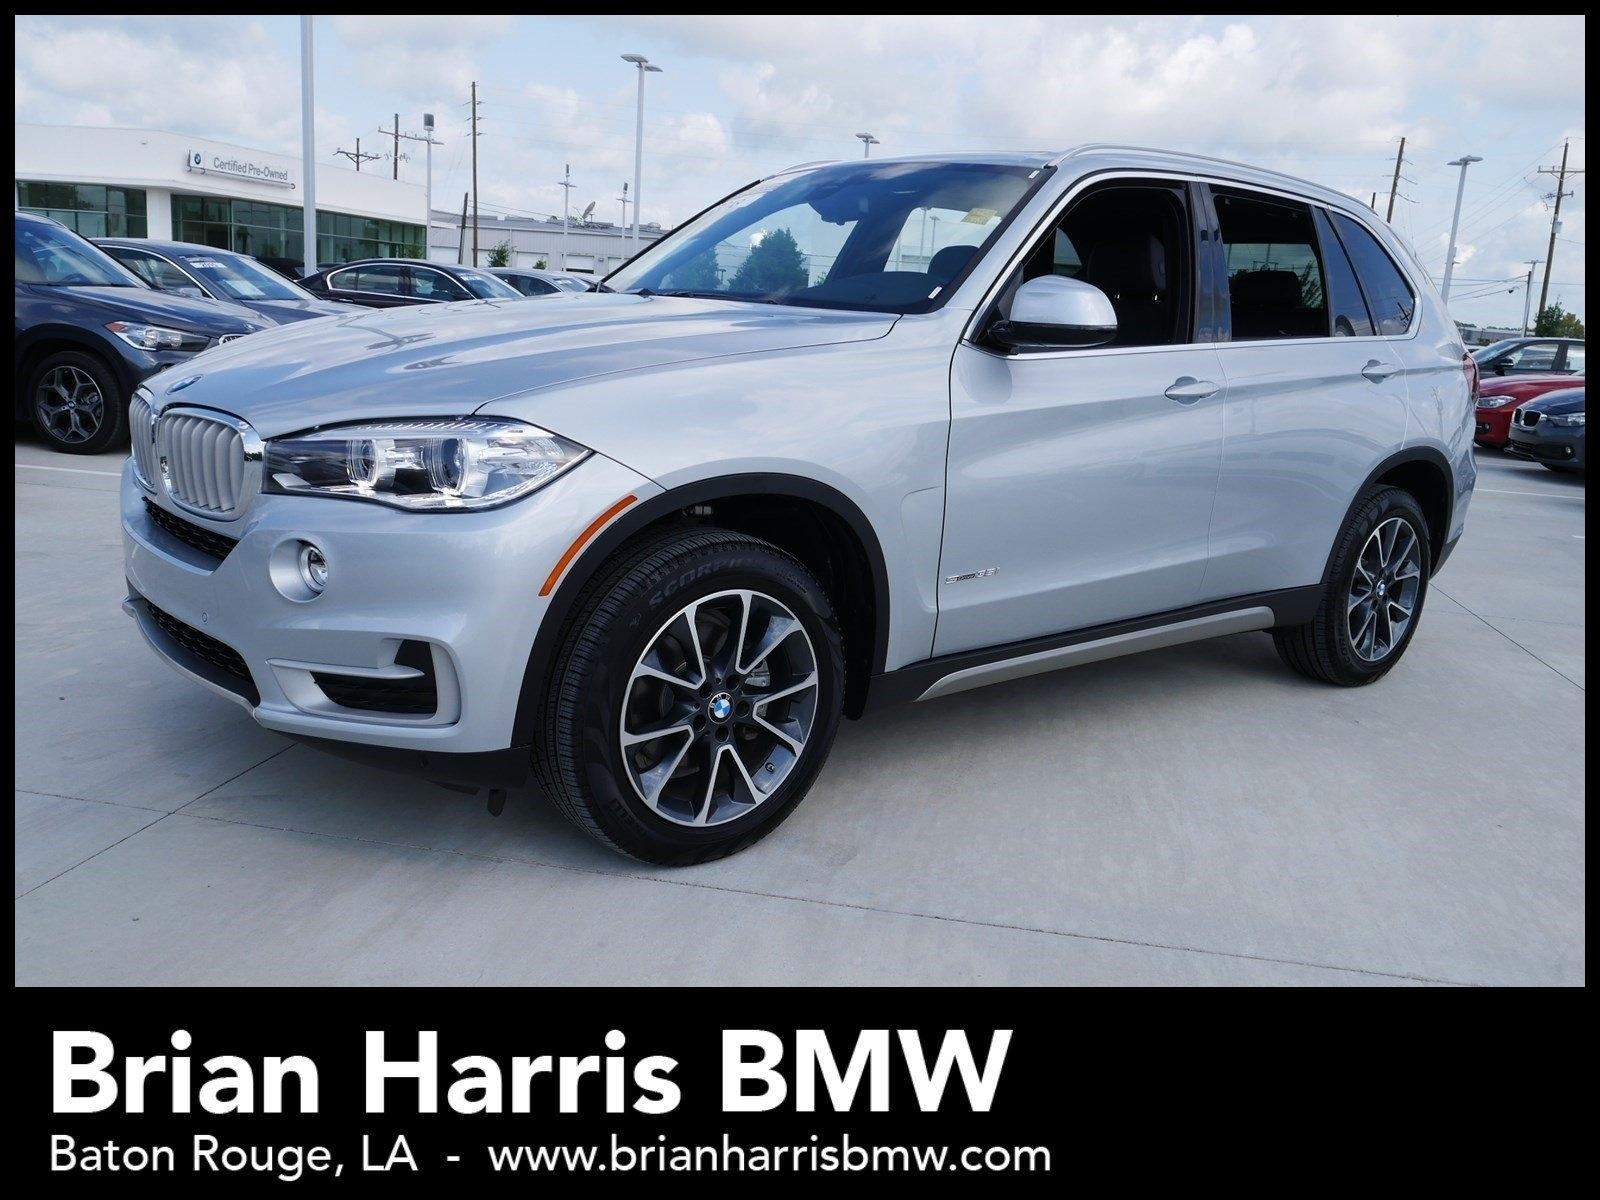 Used Certified 2018 BMW X5 sDrive35i in Baton Rouge LA Brian Harris BMW